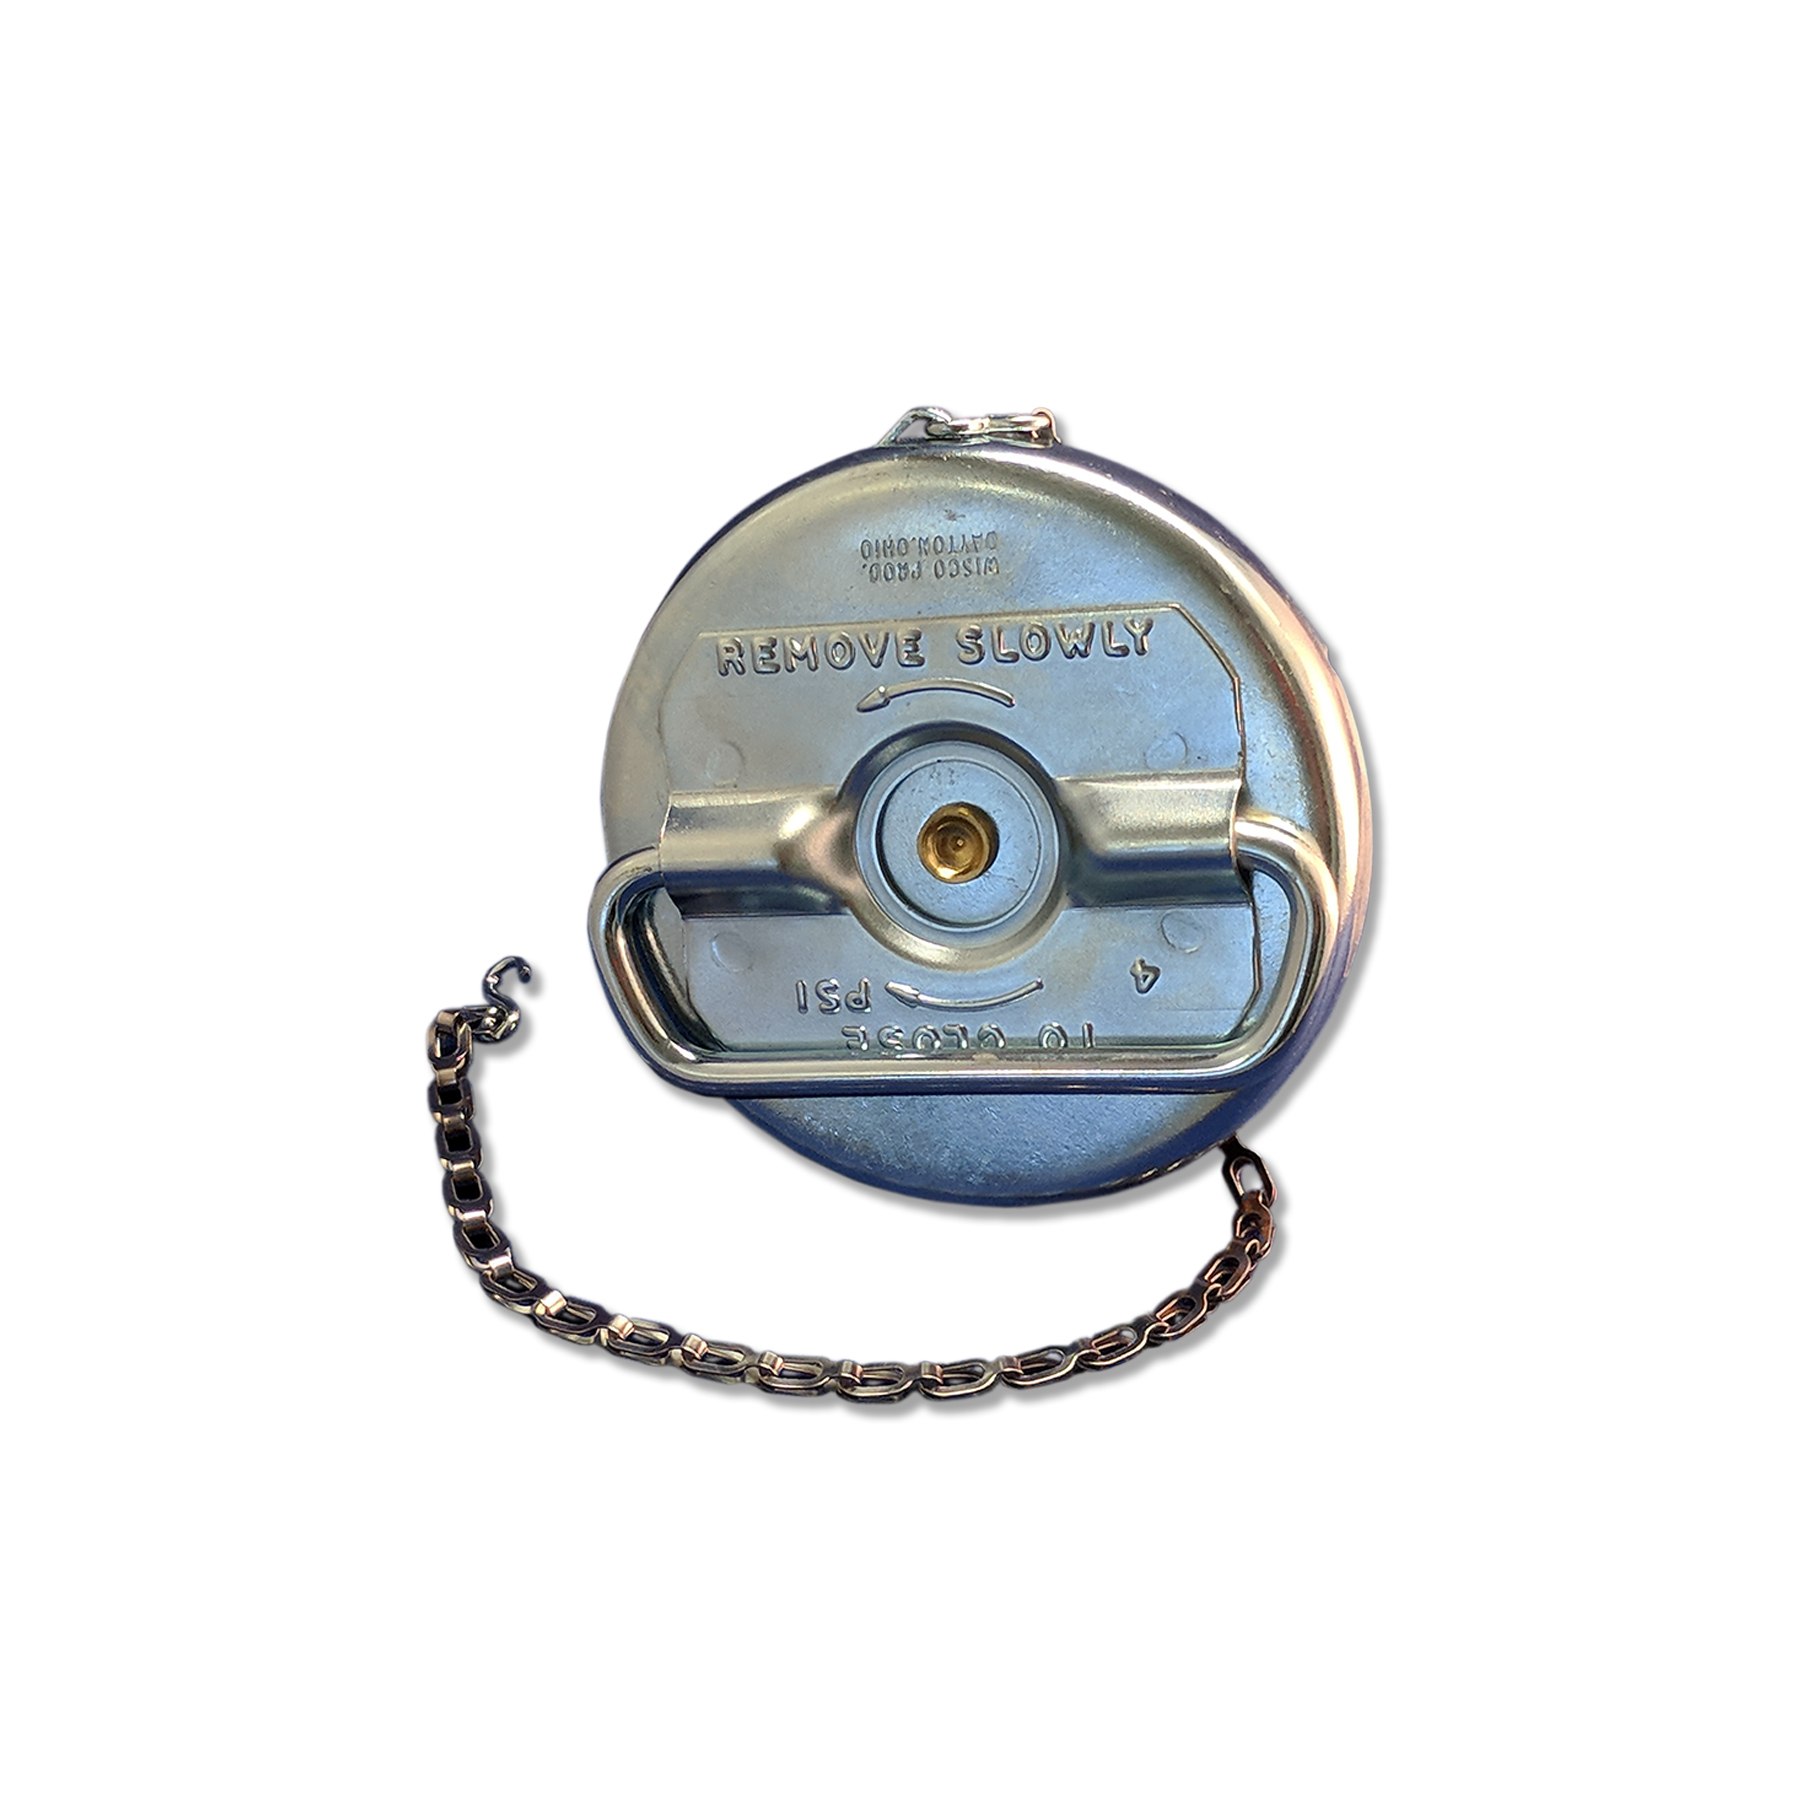 Radiator Cap with Bail